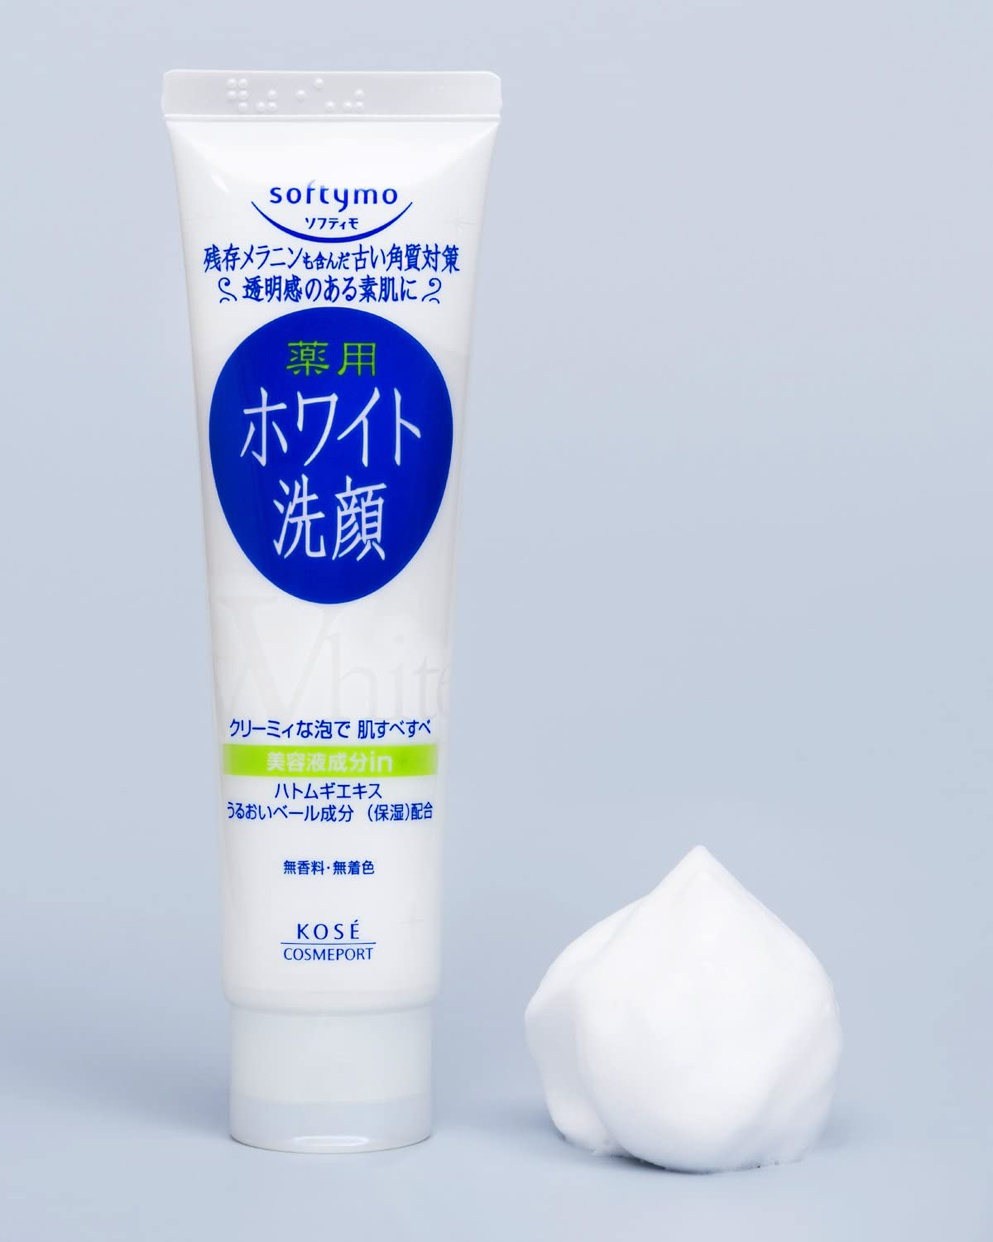 softymo(ソフティモ) 薬用ホワイト 洗顔フォーム